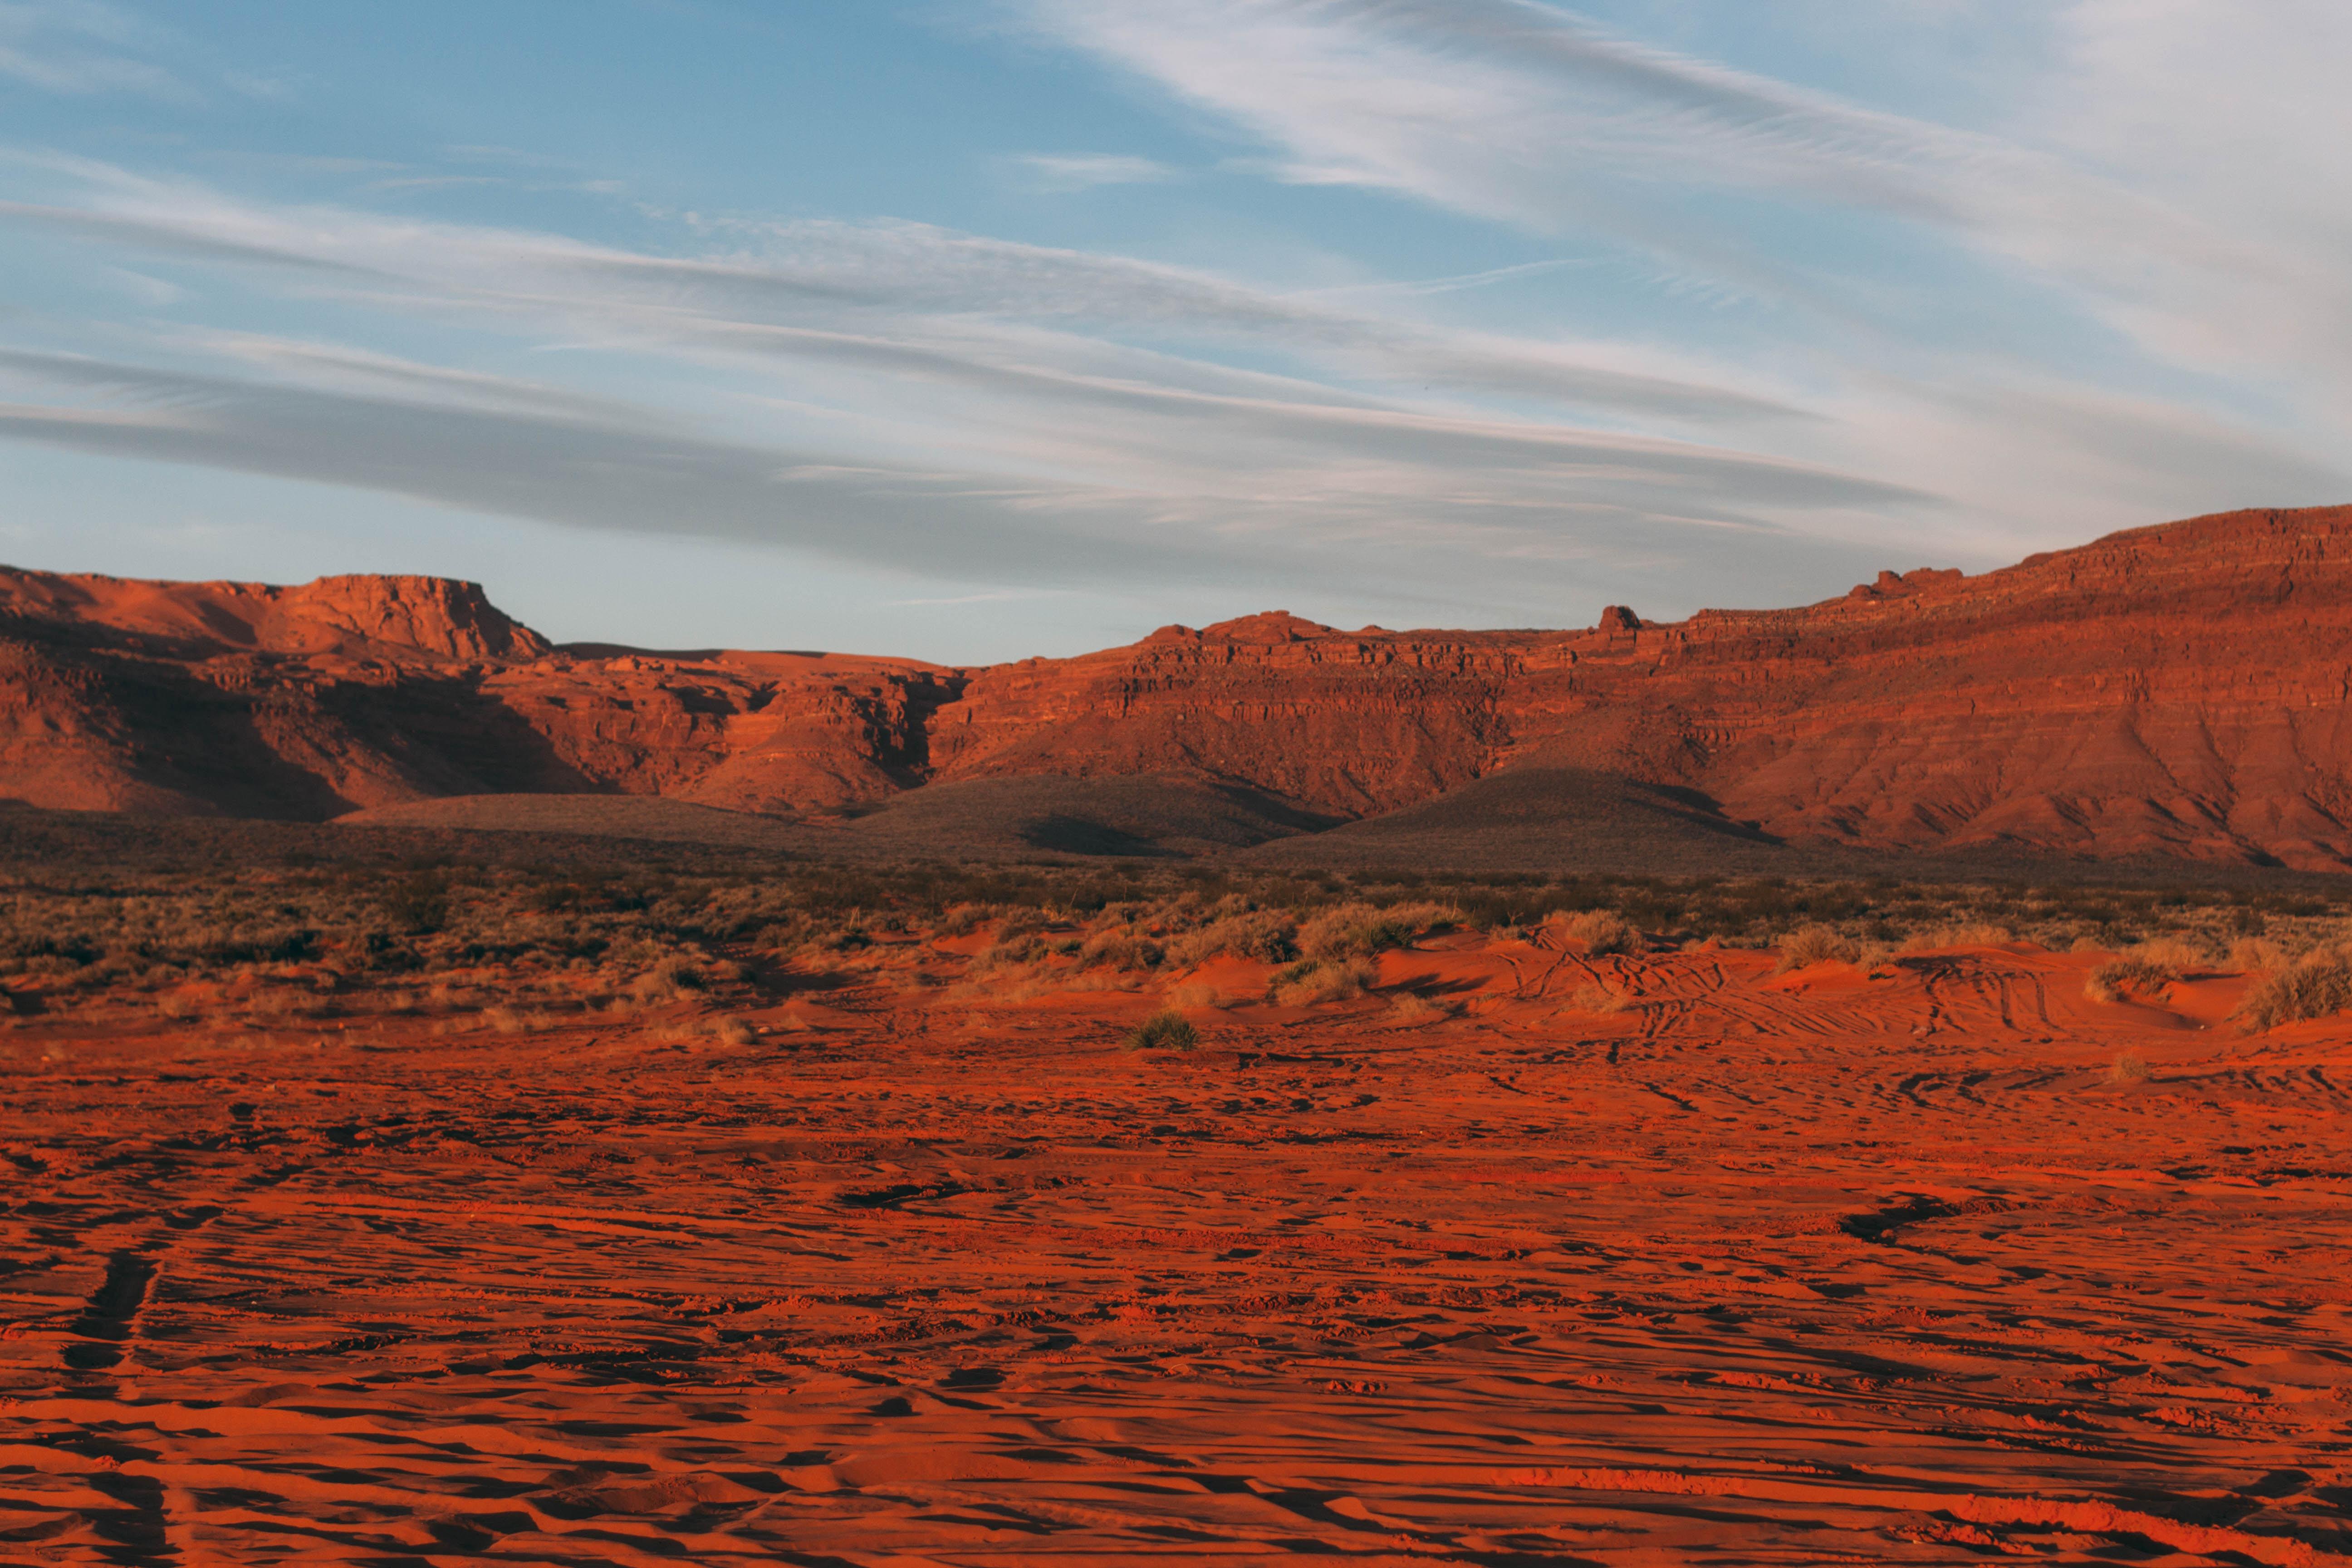 Red rock and sand in a barren desert terrain